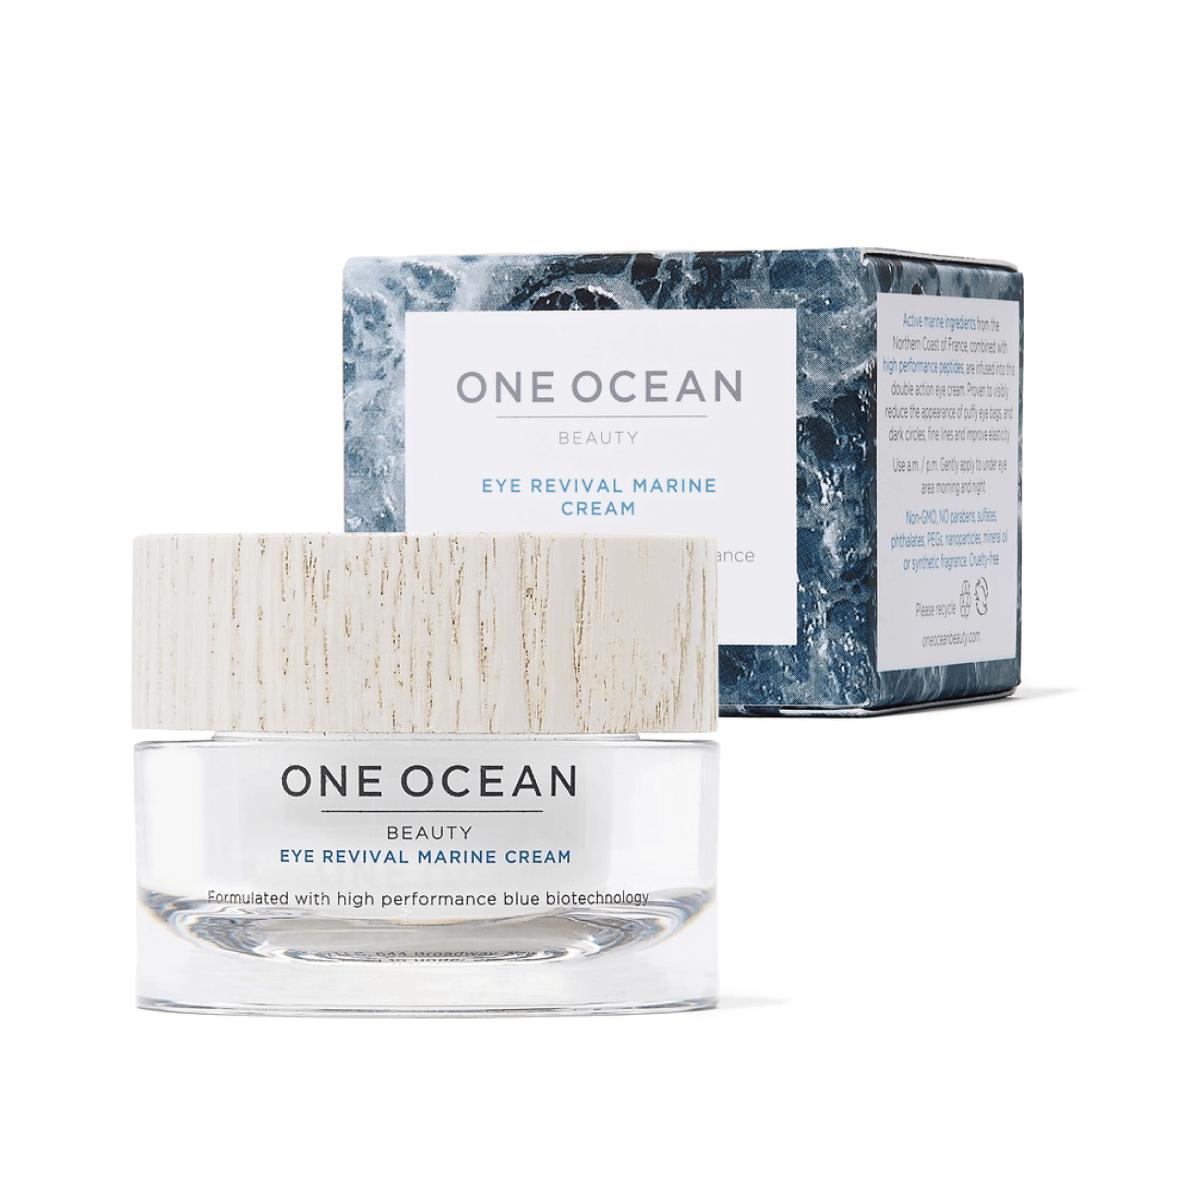 One Ocean Eye Revival Marine Cream